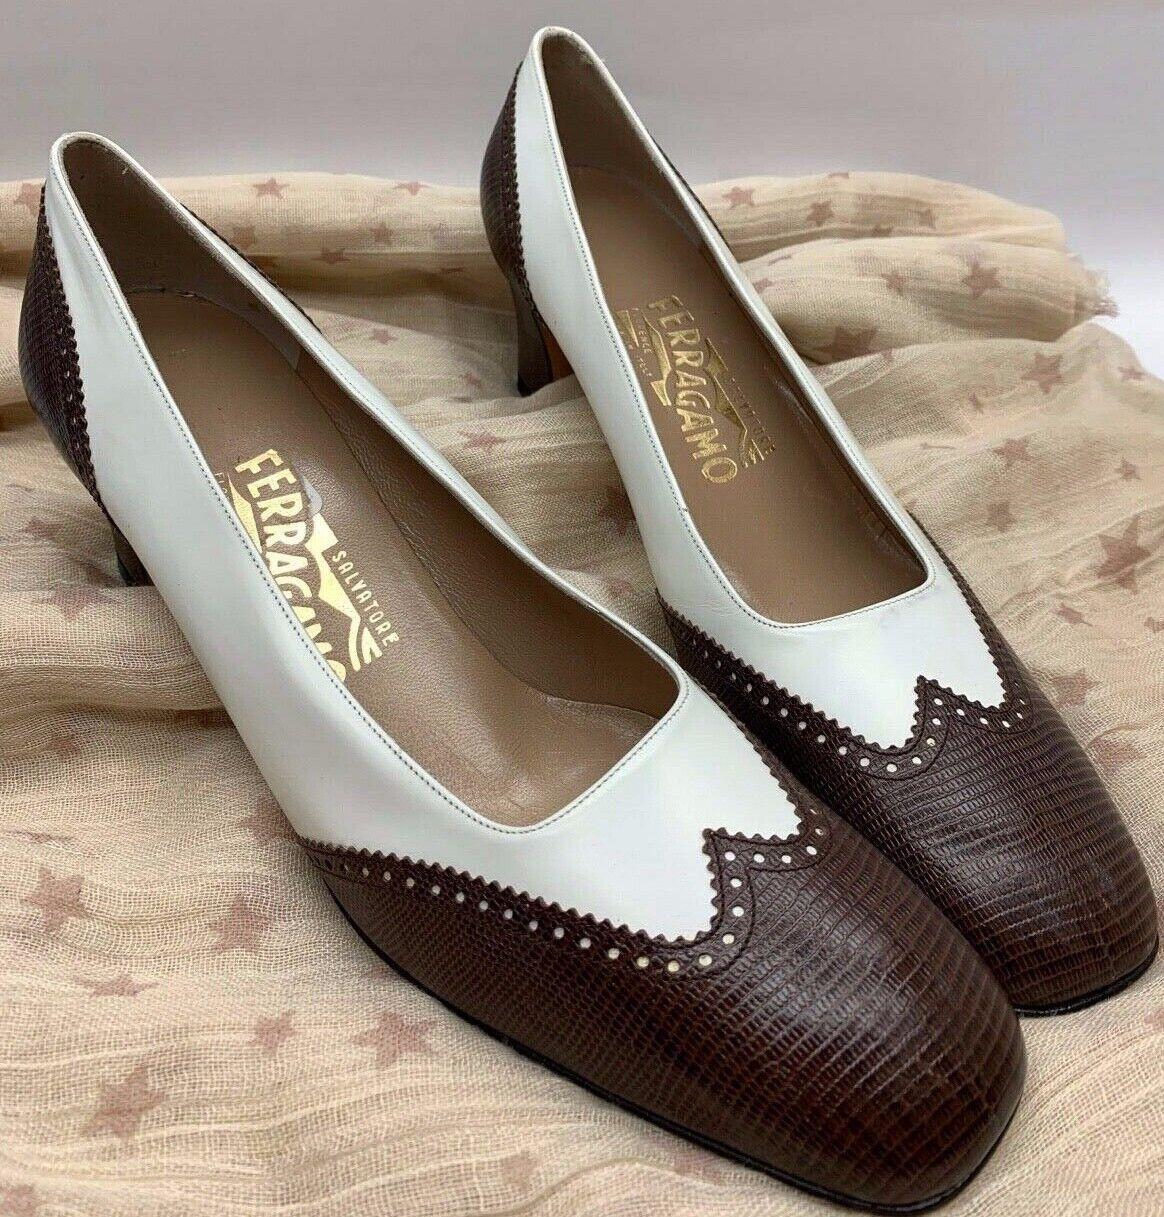 NEW SALVATORE FERRAGAMO Heels Ivory Brown Wing Tip Crocodile Leather Pumps 9 1 2